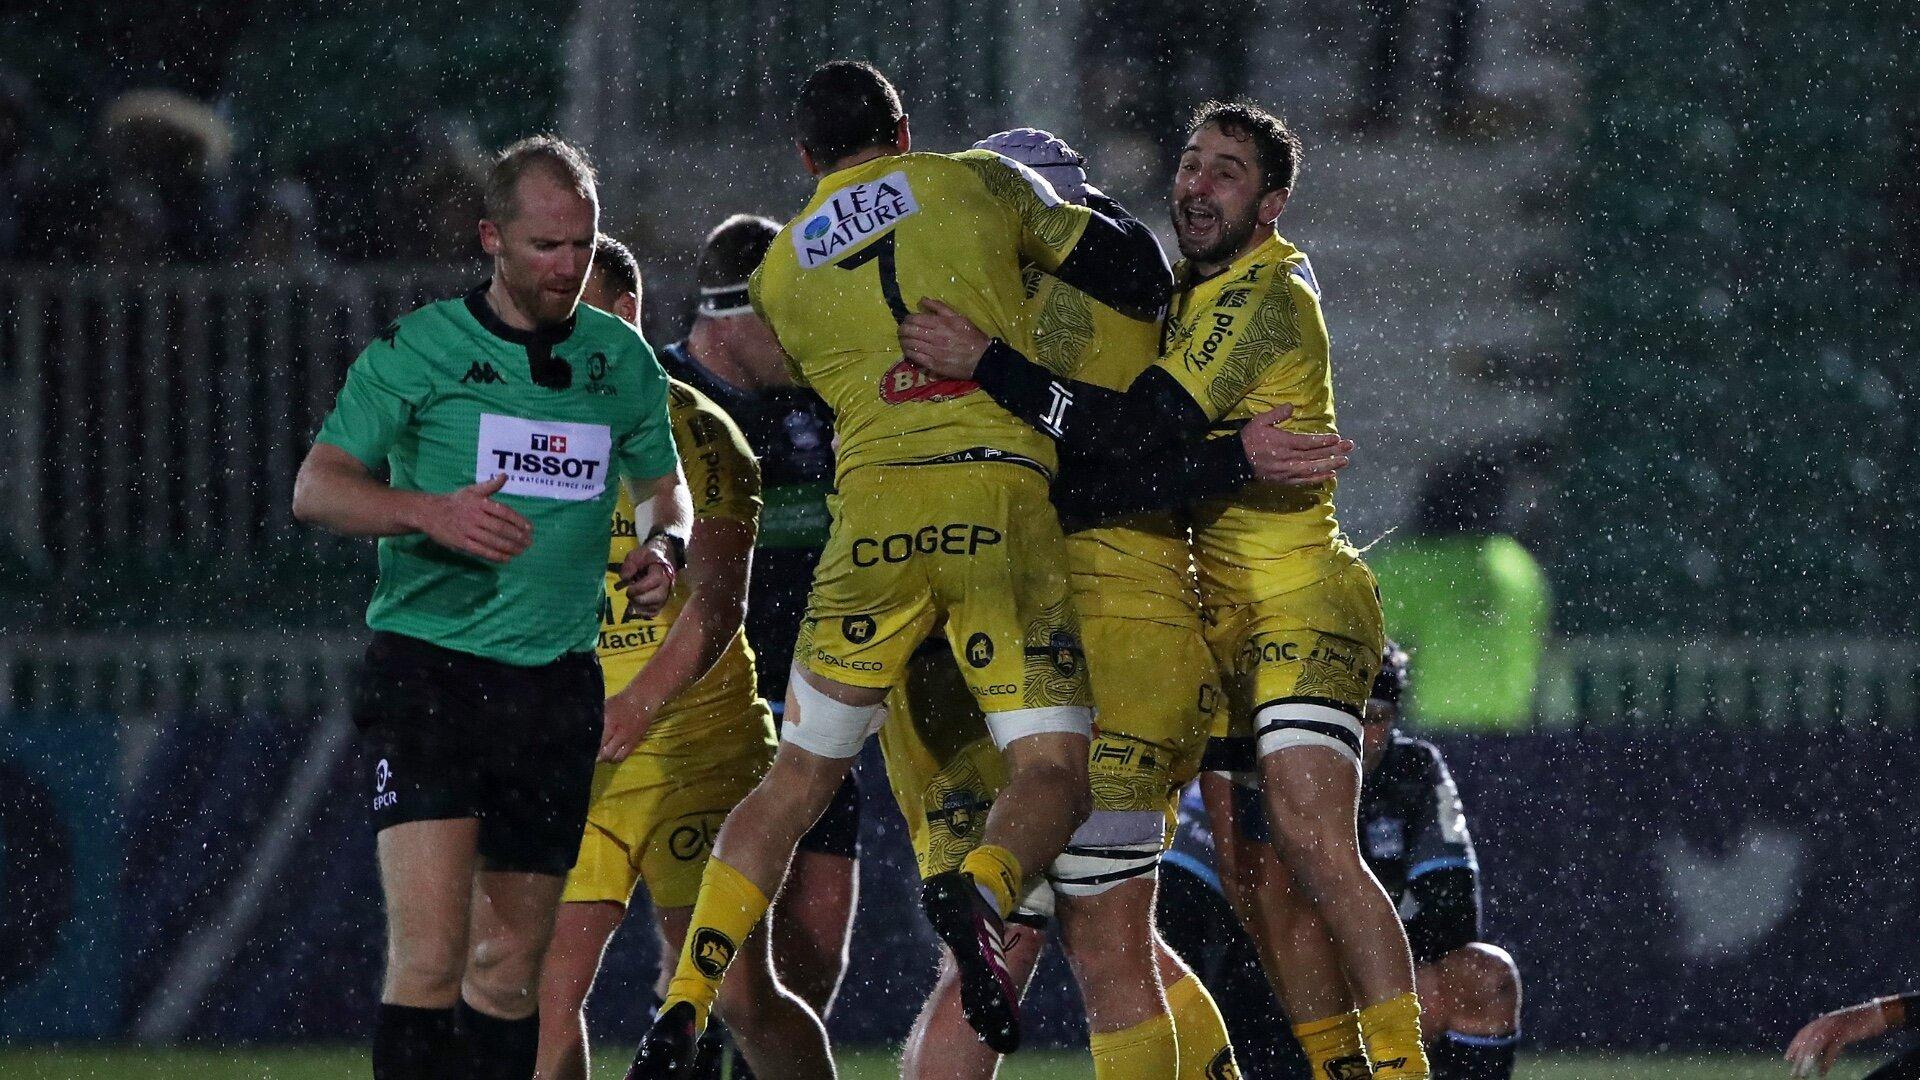 Top 14 club-by-club 2020/21 season preview: La Rochelle